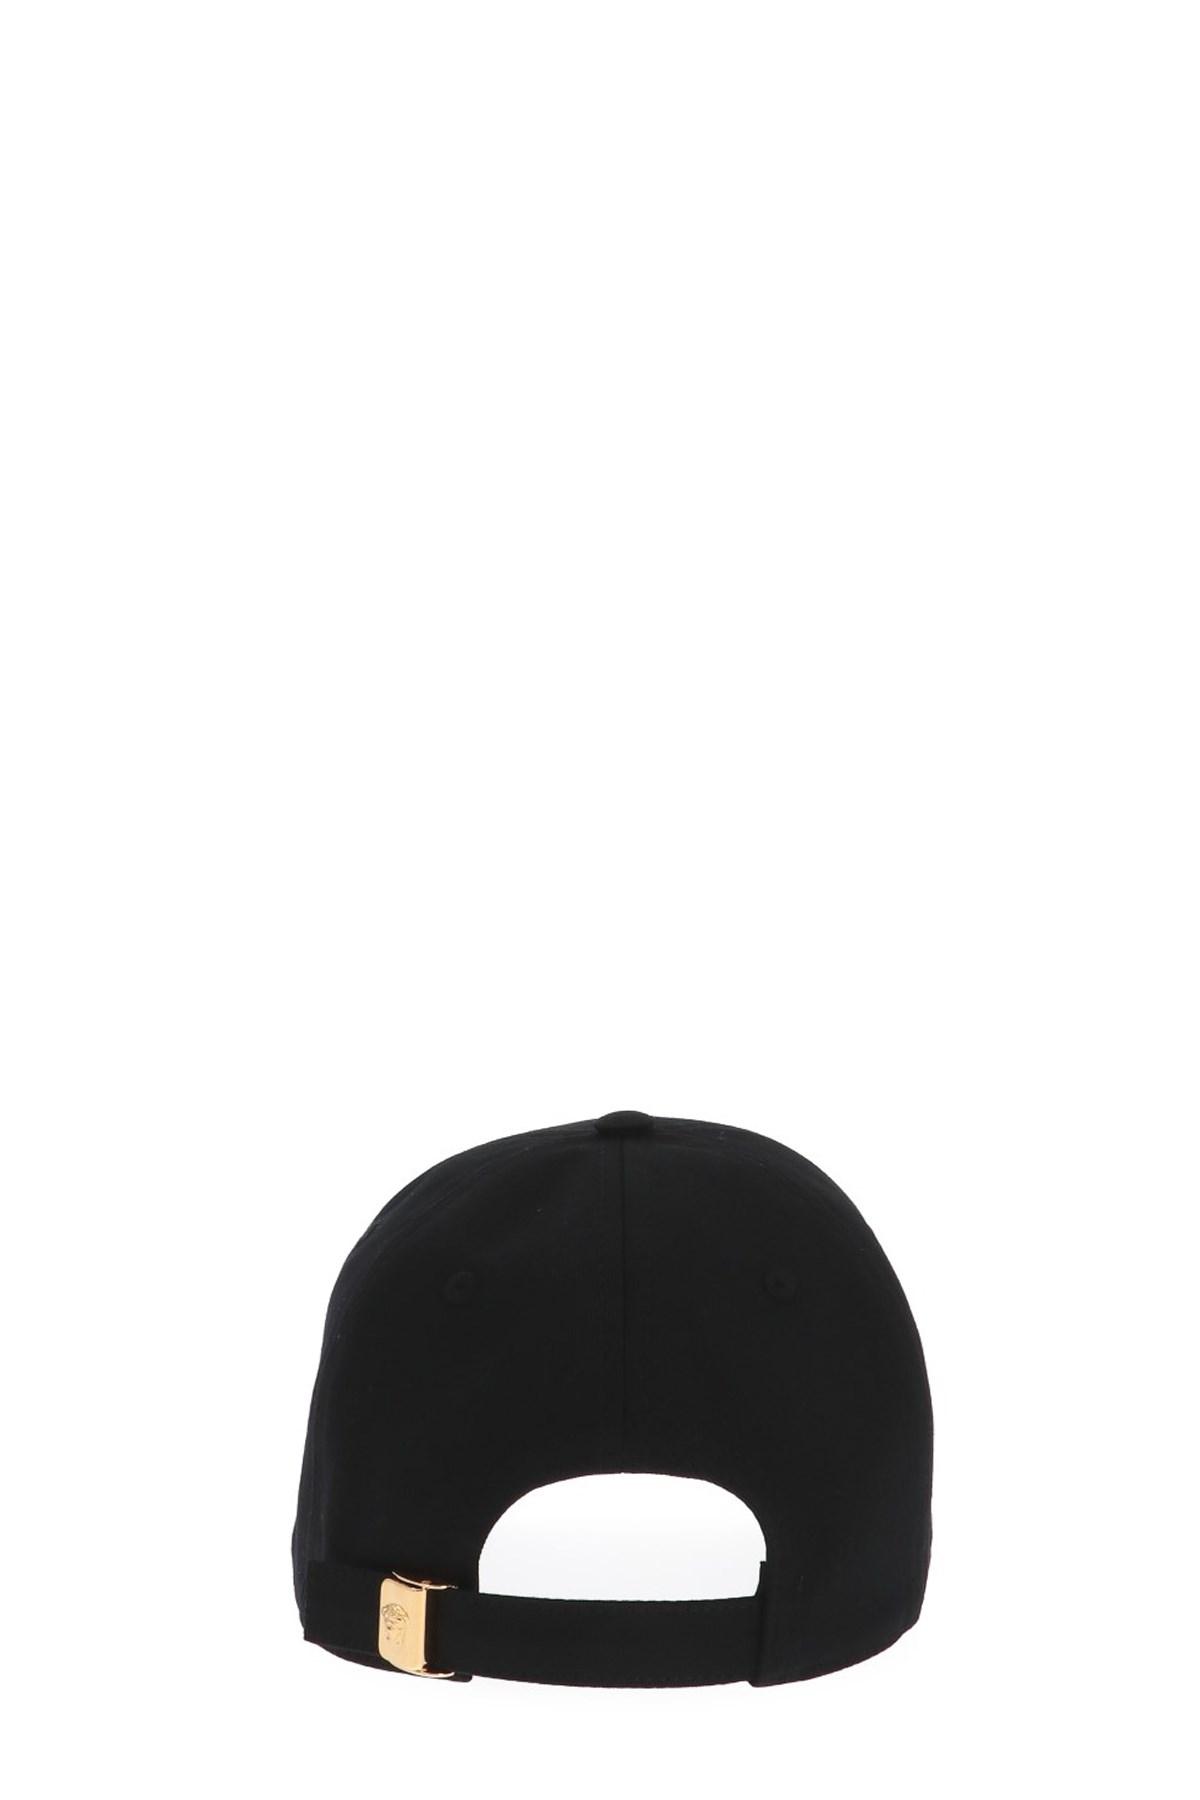 27a613ab34677 versace logo cap available on julian-fashion.com - 67723